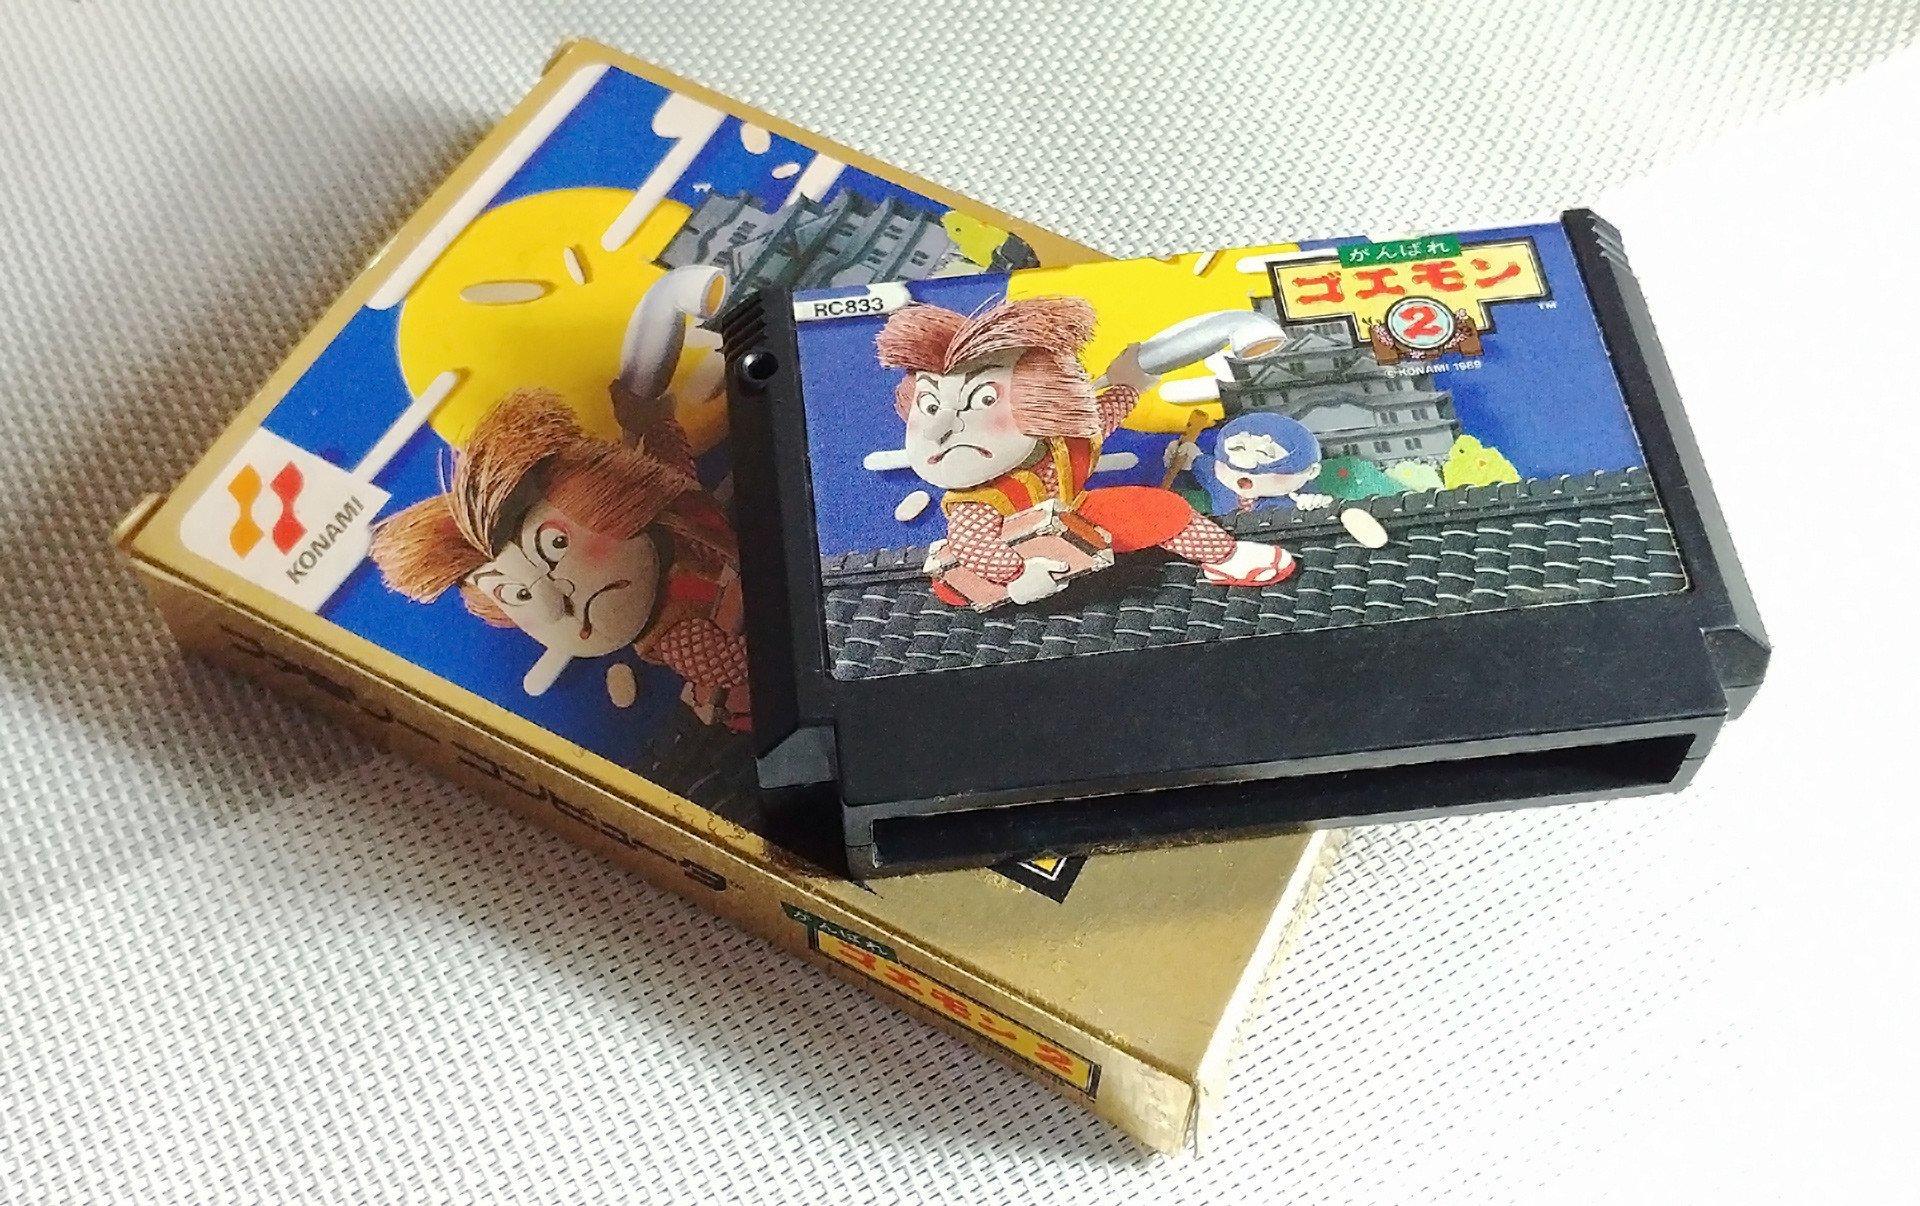 ganbare goemon 2 Famicom cartridge